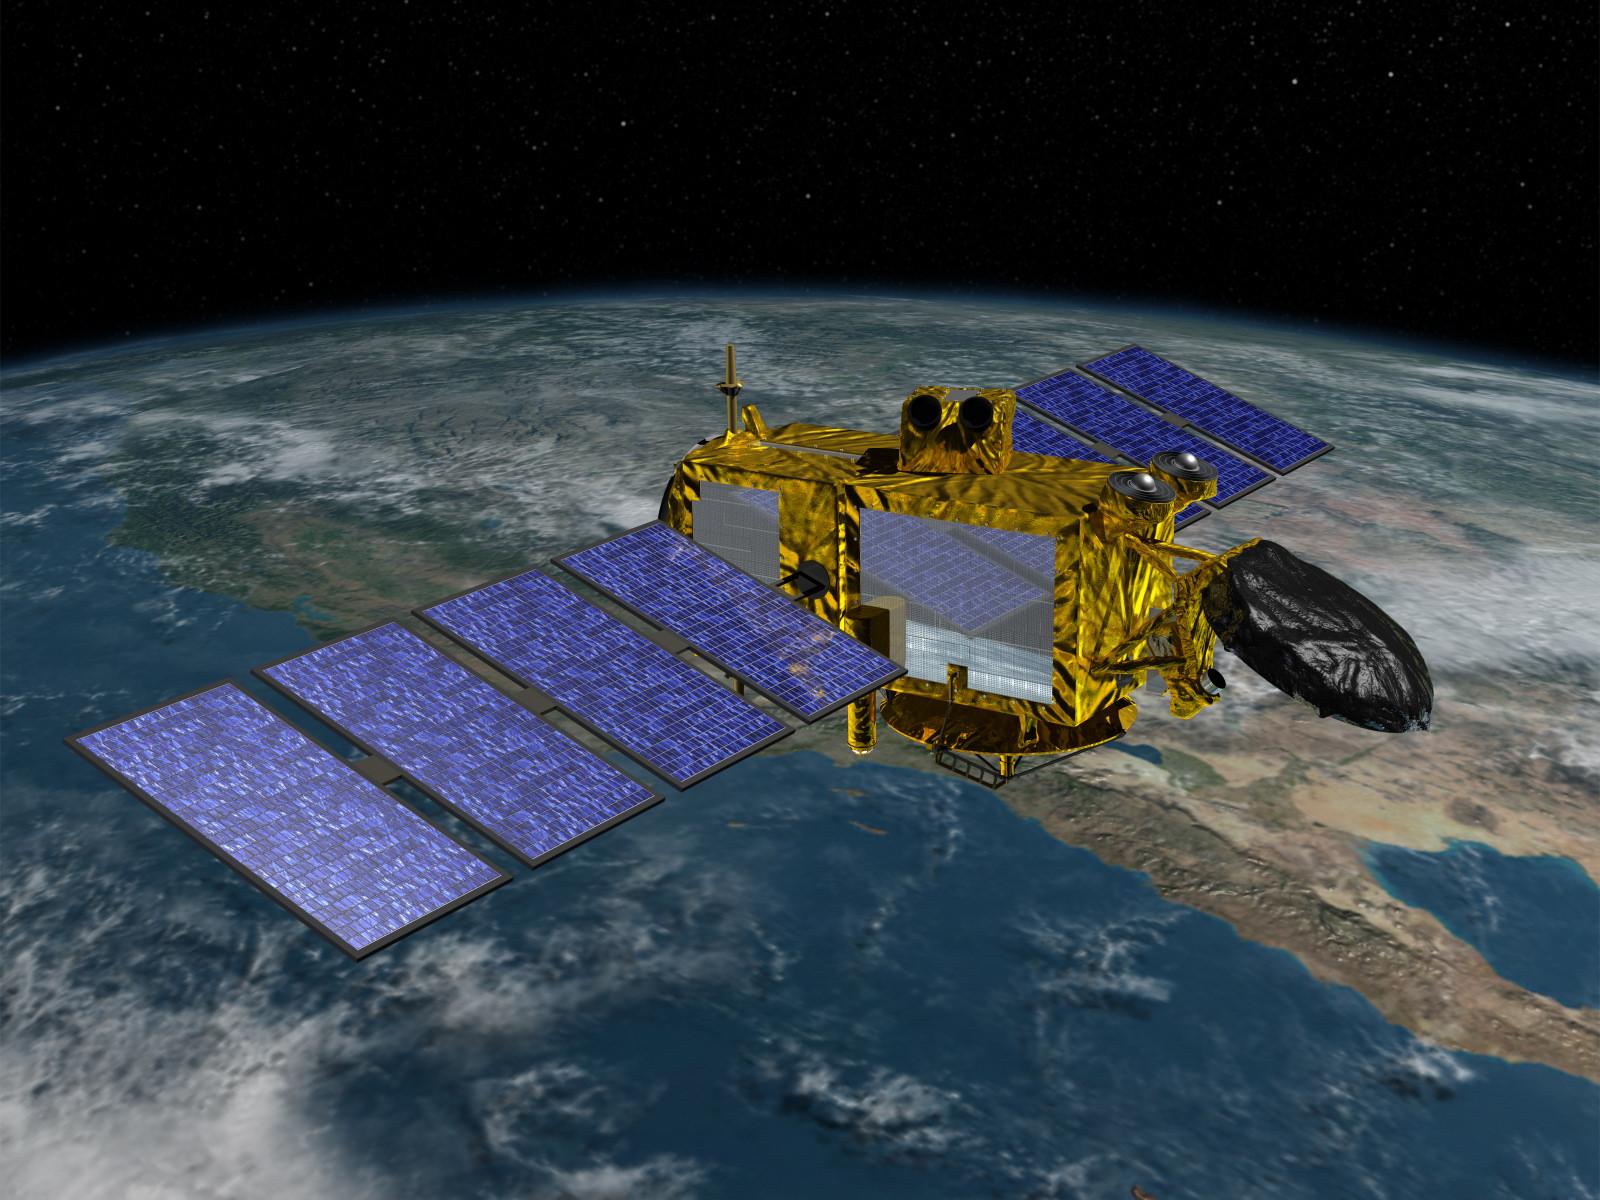 Jason-3 Satellite Concept